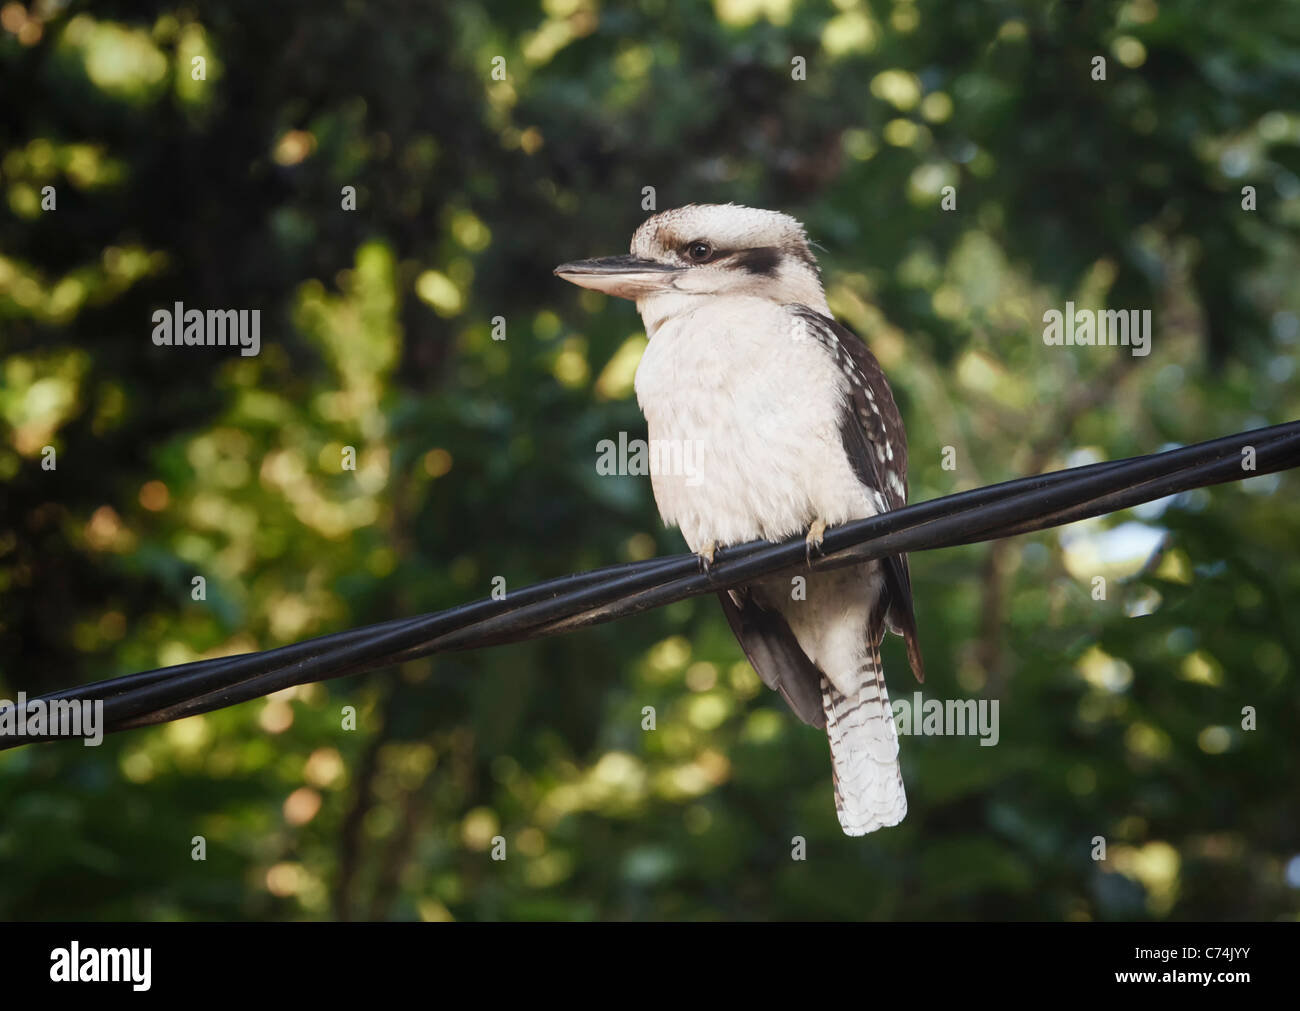 Kookaburra, genus Dacelo. Bird native to Australia and New Guinea. Here seen in suburban setting. - Stock Image